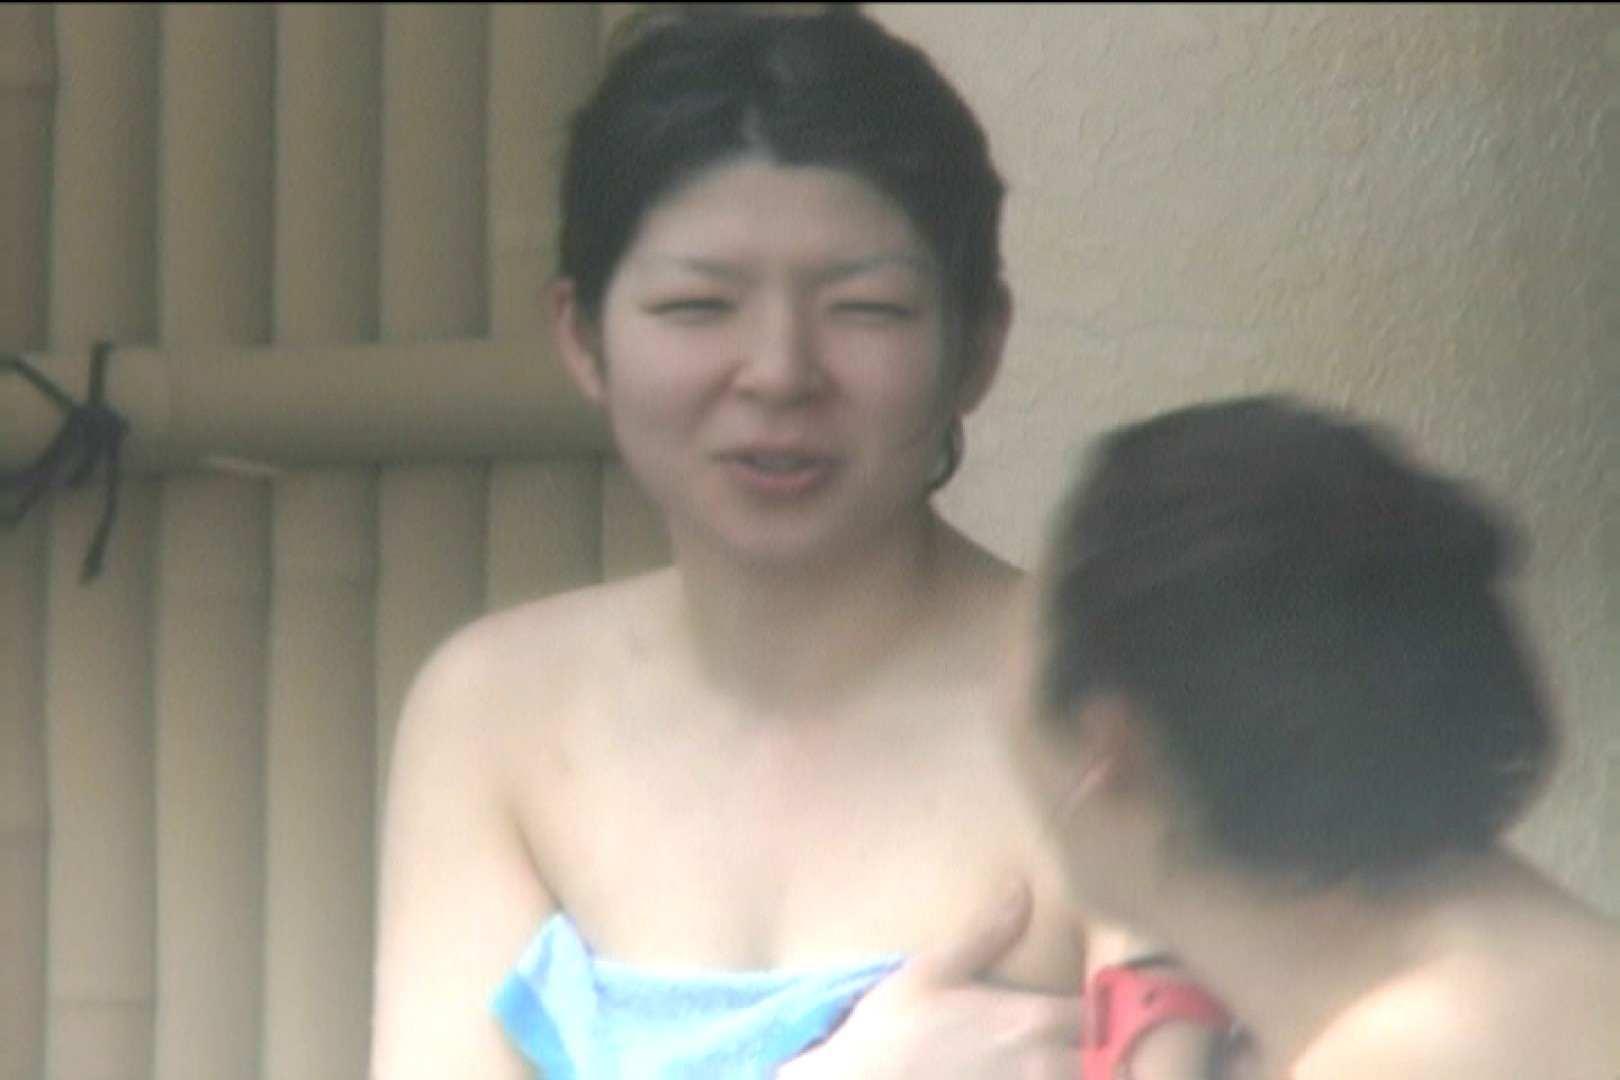 Aquaな露天風呂Vol.139 盗撮シリーズ | 露天風呂編  79PIX 57